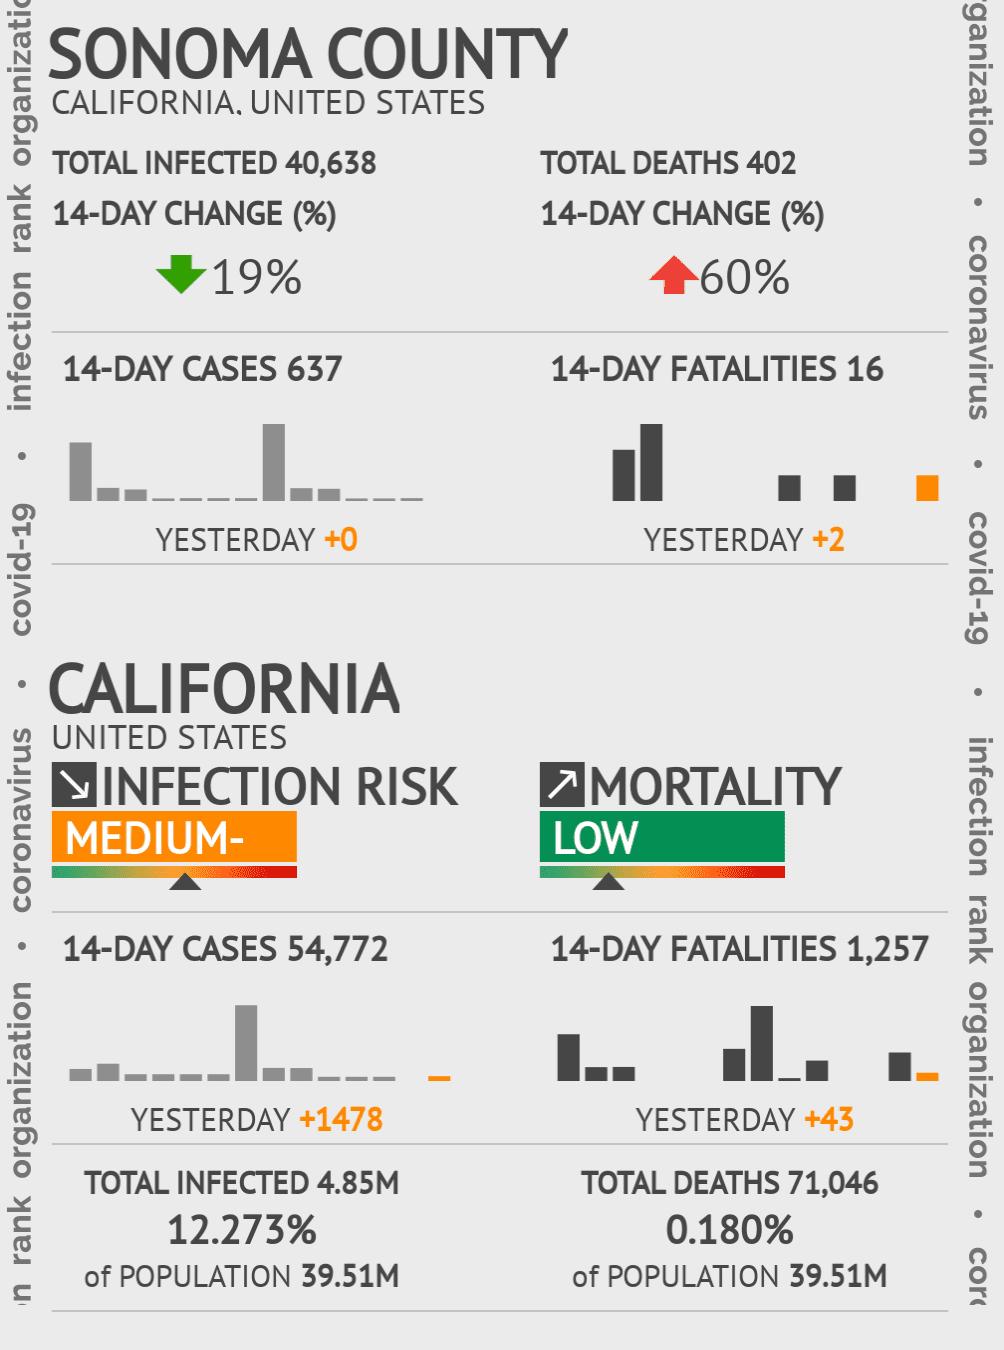 Sonoma County Coronavirus Covid-19 Risk of Infection on October 29, 2020